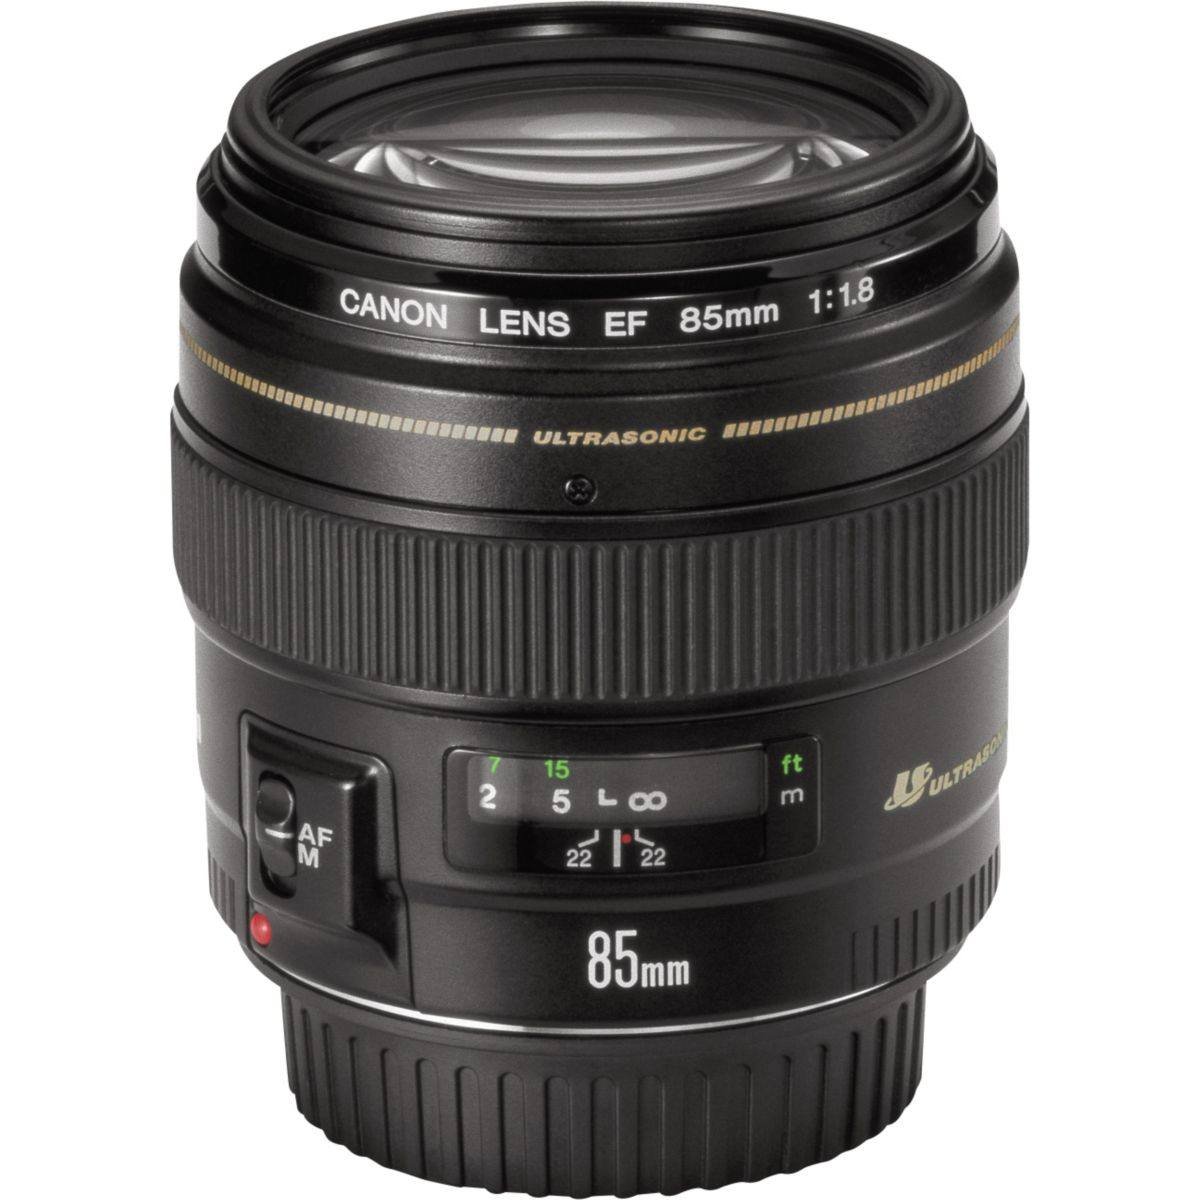 Objectif pour reflex plein format canon ef 85mm f/1.8 usm